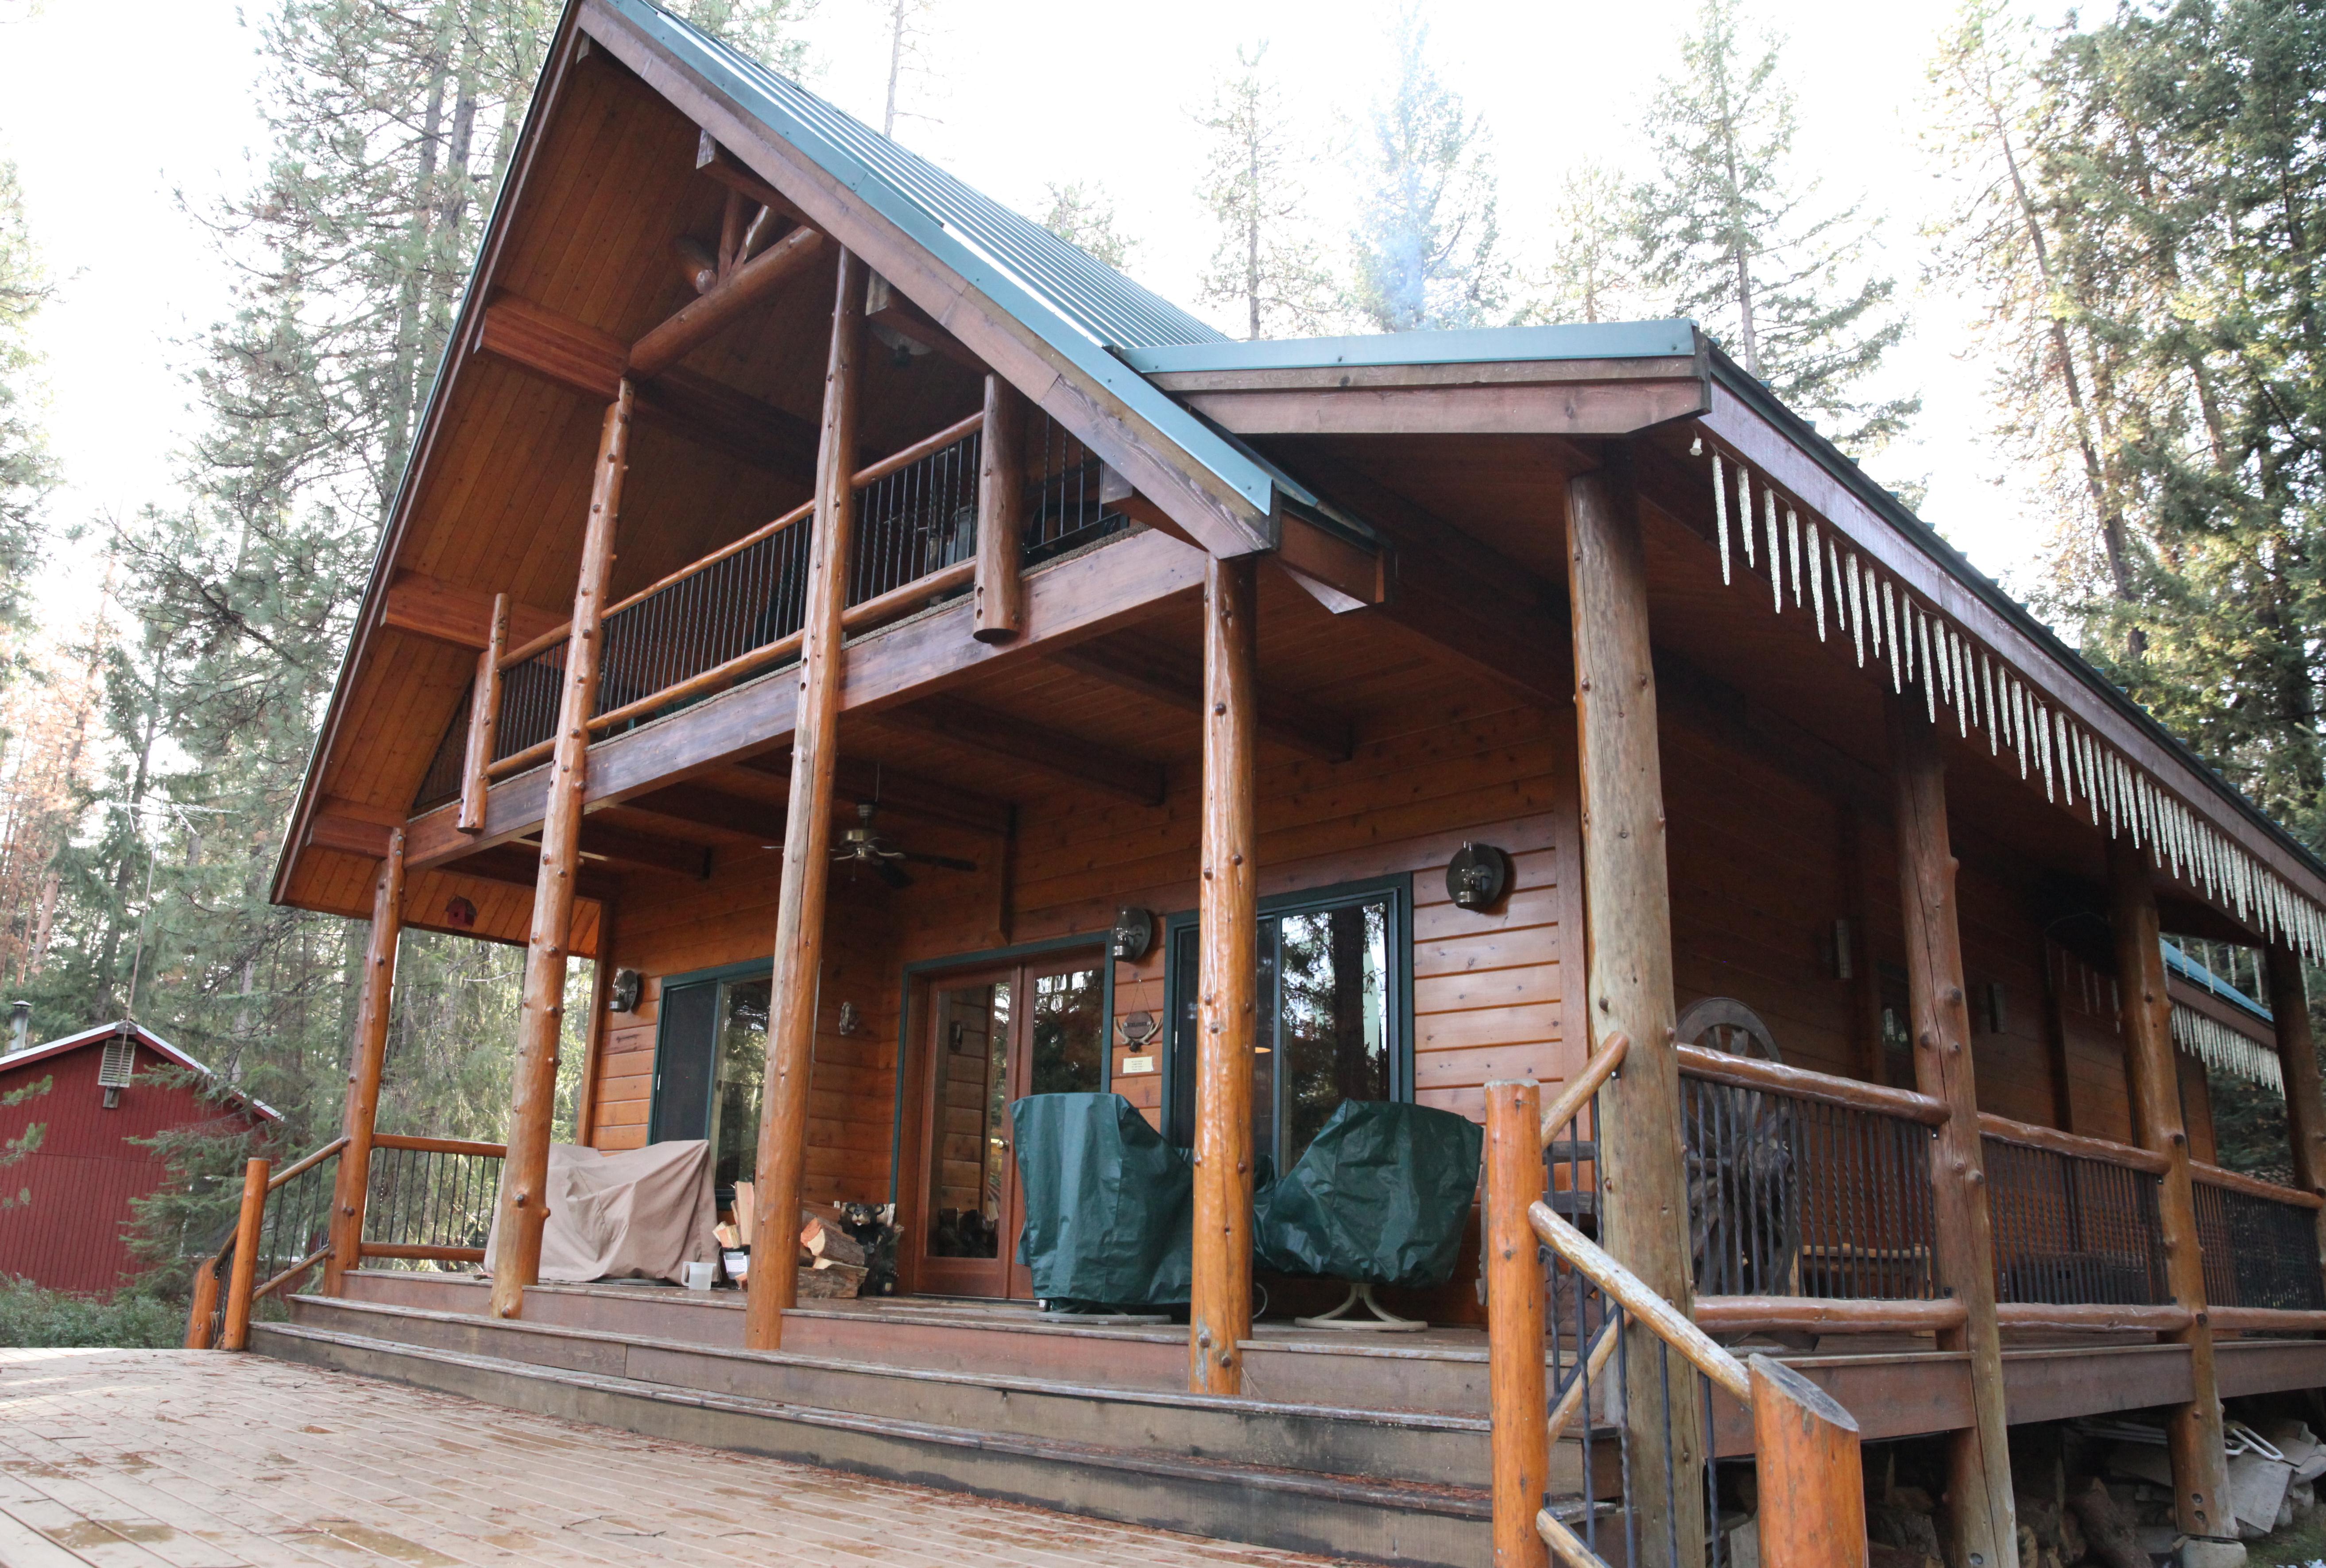 rental life last minute pigeon cabin forge bedroom luxury cabins gatlinburg rentals of